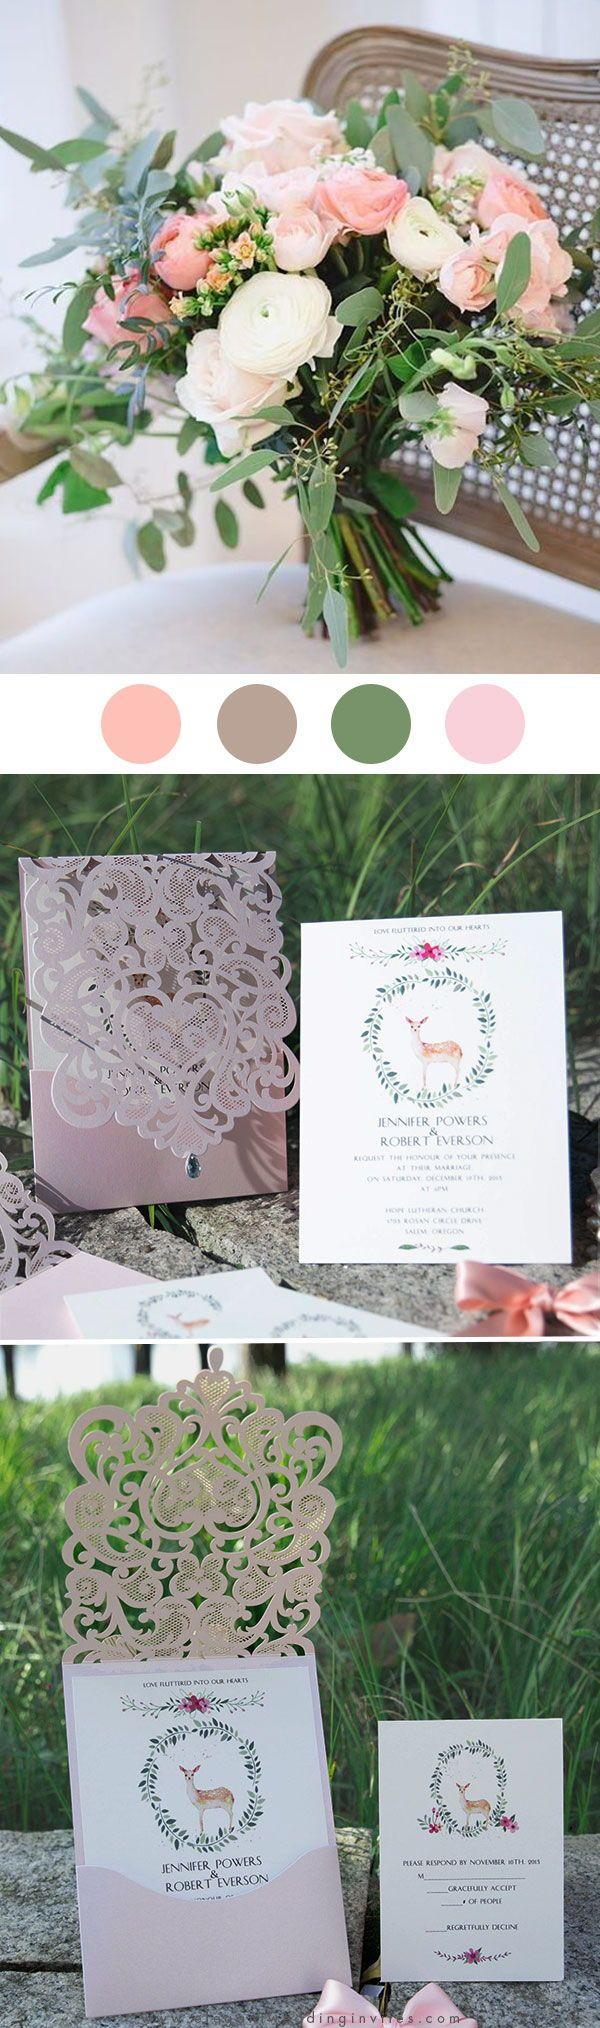 Romantic Blush Pink Pocket Laser Cut Wedding Invitations with Rhinestone EWWS222 #summerwedding #pinkweddinginvitations